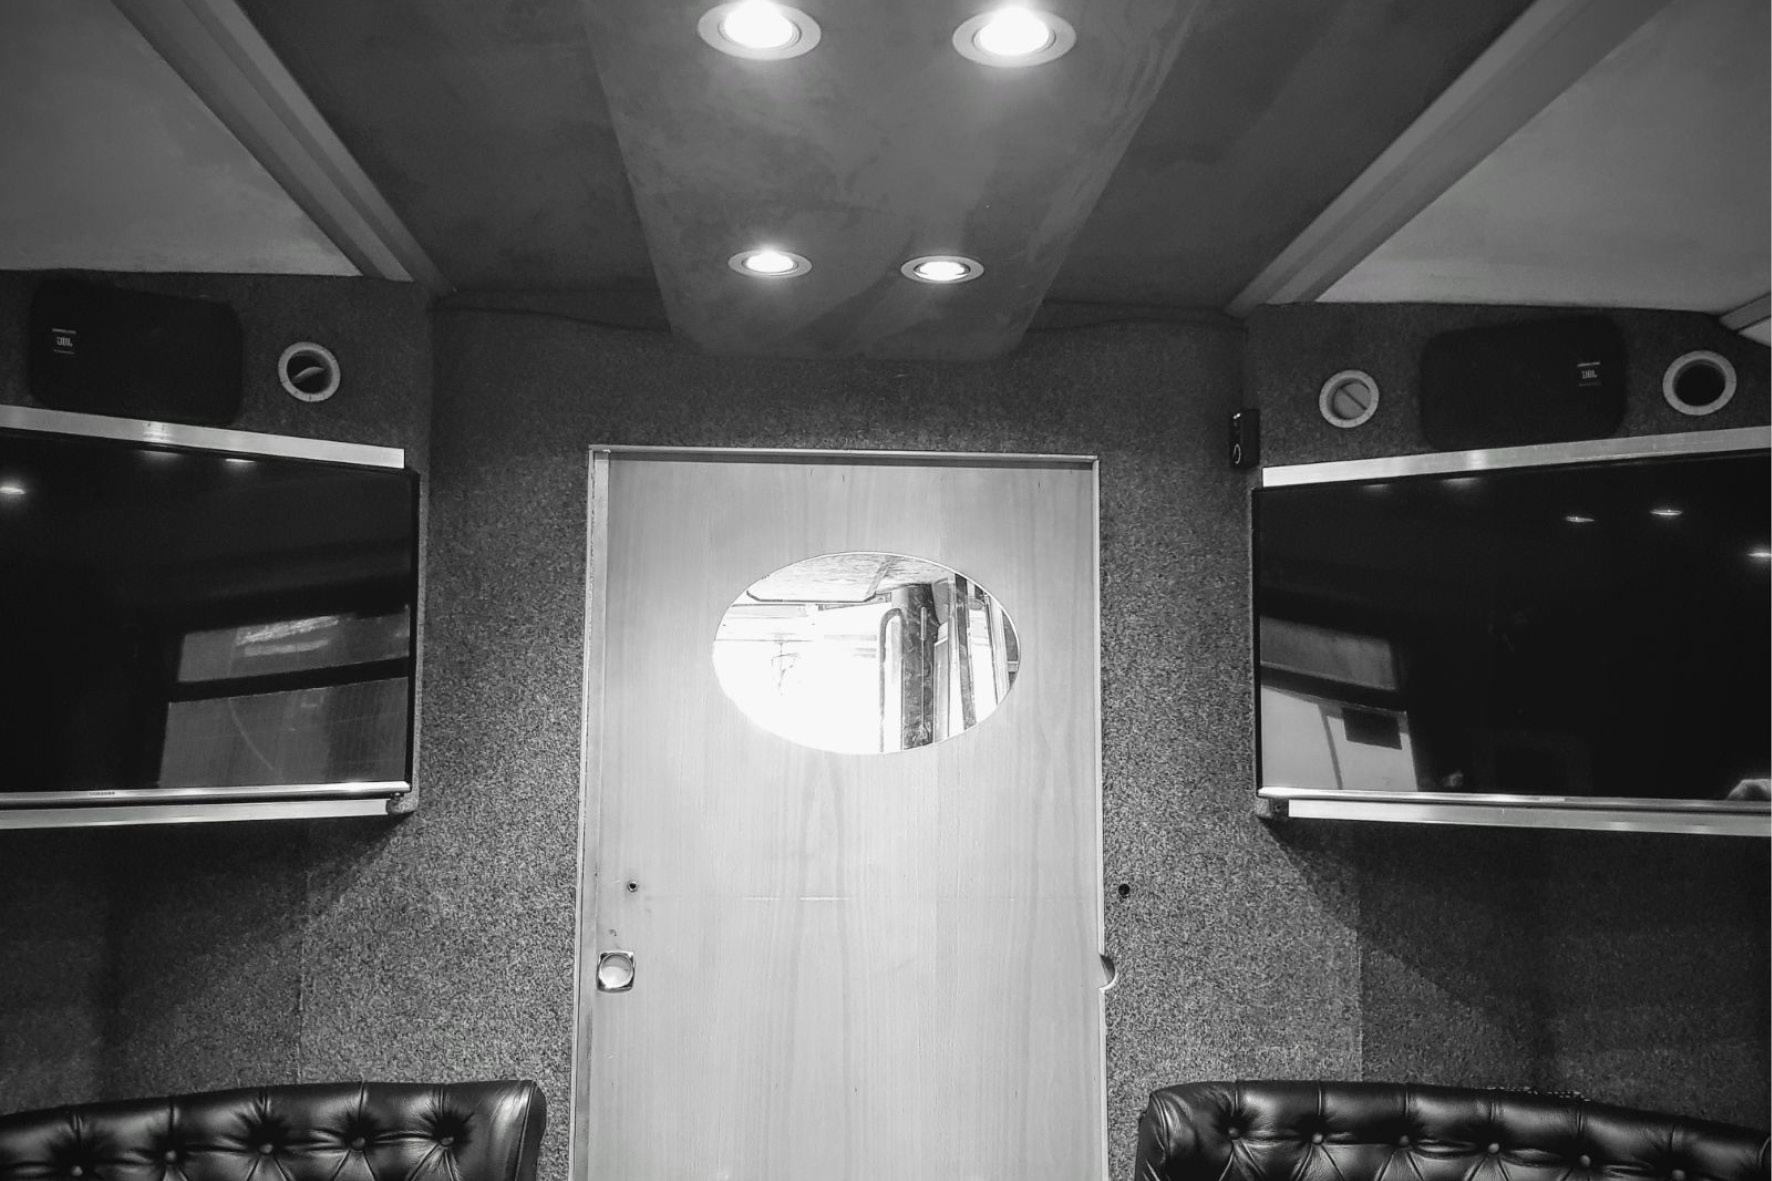 bus_business_normandy_2018_3.jpg